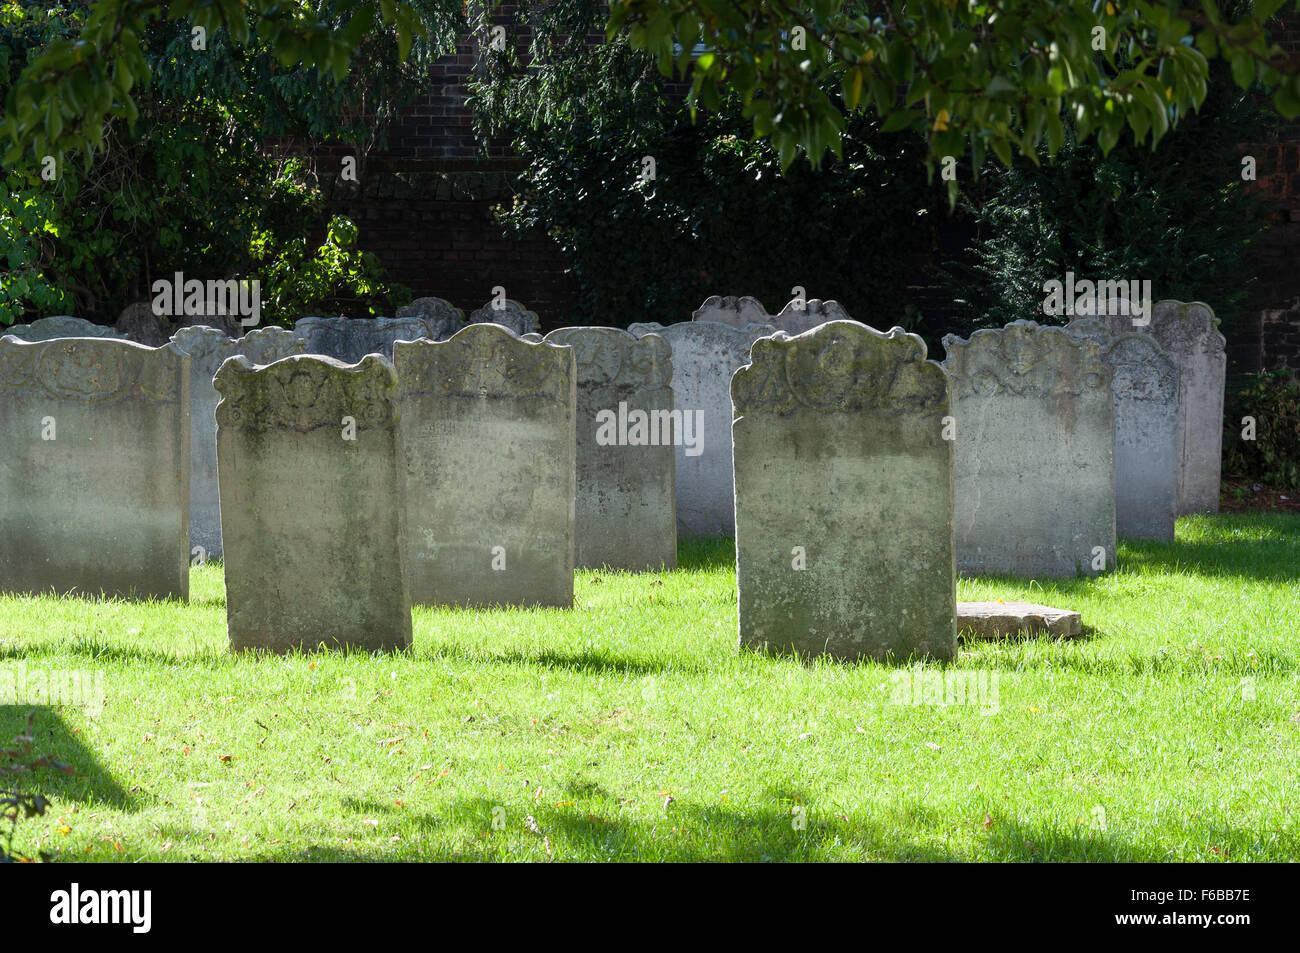 Headstones in churchyard of St Nicholas Church, London Road, Strood, Kent, England, United Kingdom - Stock Image